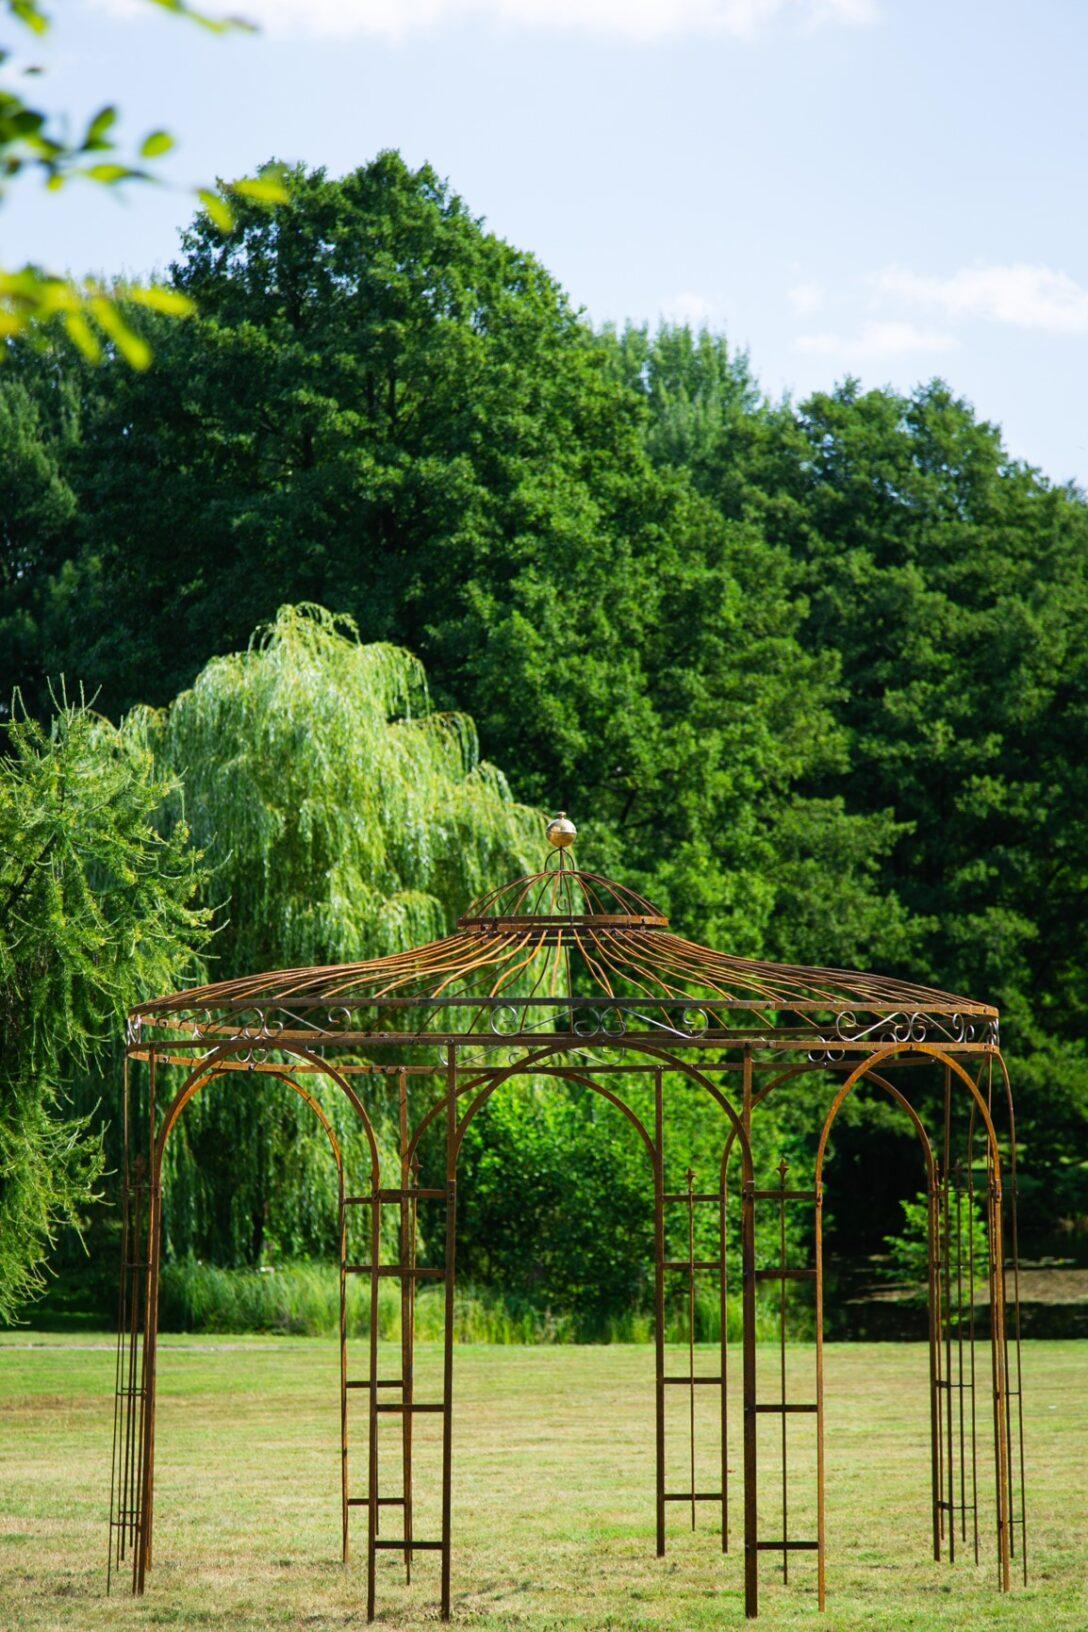 Large Size of Pavillon Eisen Gartenpavillon Metall Rost 250cm Eleganz Garten Wohnzimmer Pavillon Eisen